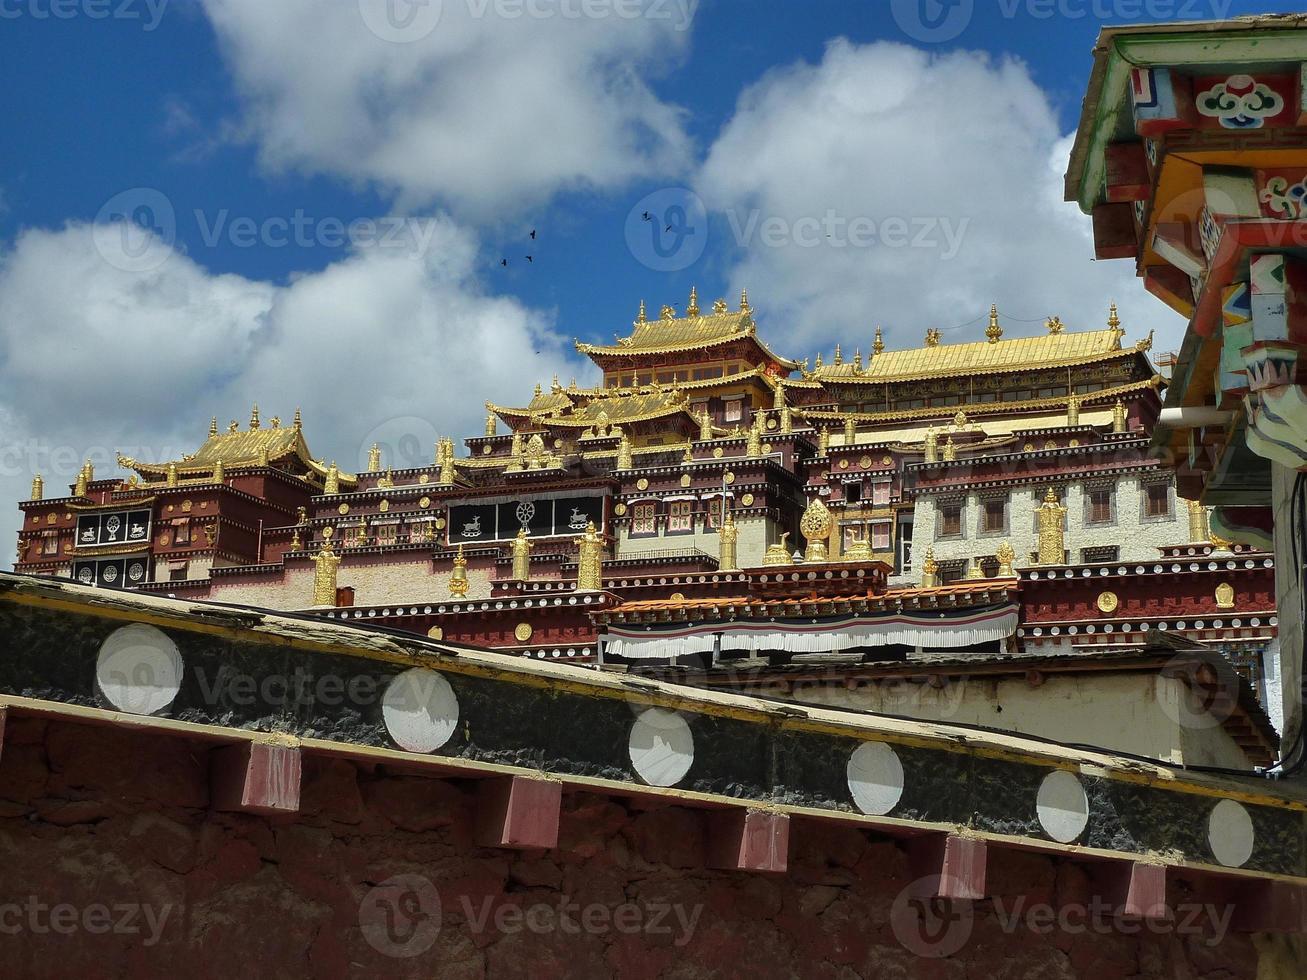 Ganden Sumtseling klooster, Tibetaanse boeddhistische tempel in Yunnan, China foto